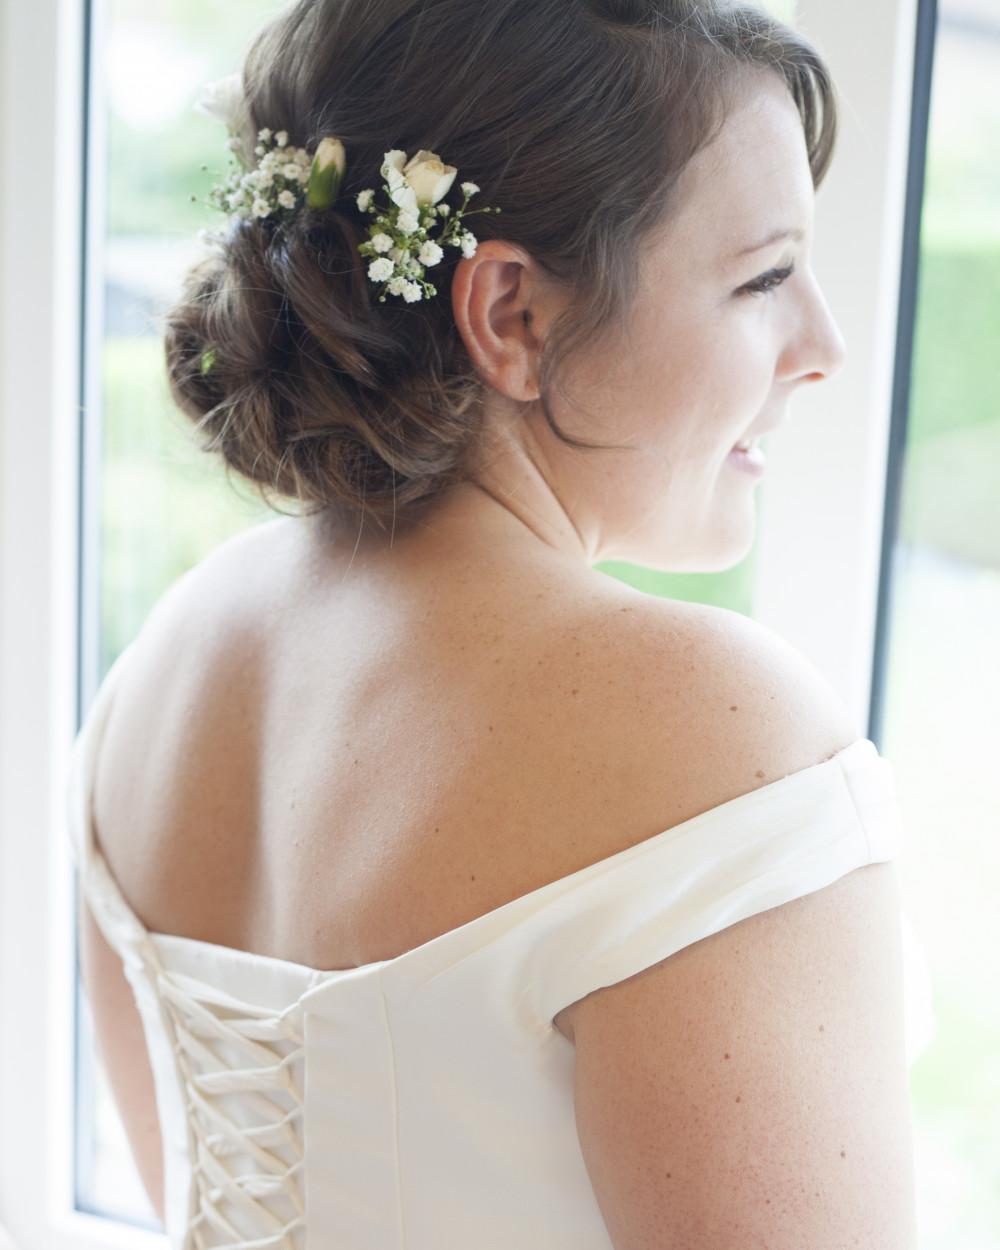 Suzy Hair and Make Up - Make Me Bridal Artist: Hello Halo Hair. Photography by: Mary Sullivan.